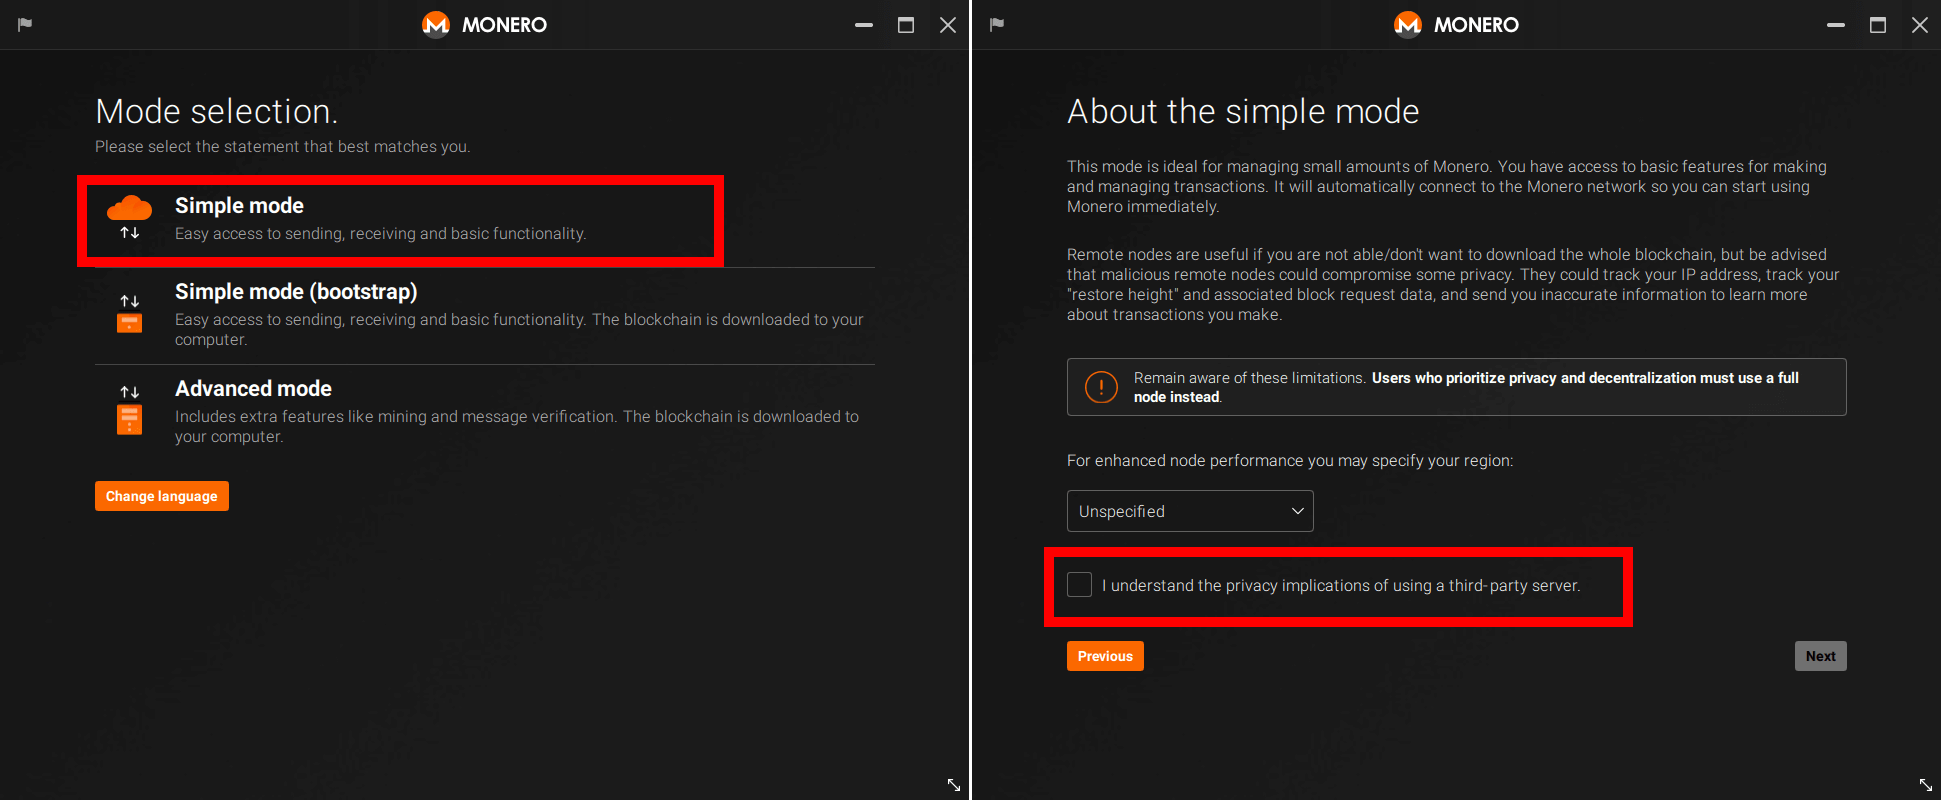 Mode 선택 : Simple mode